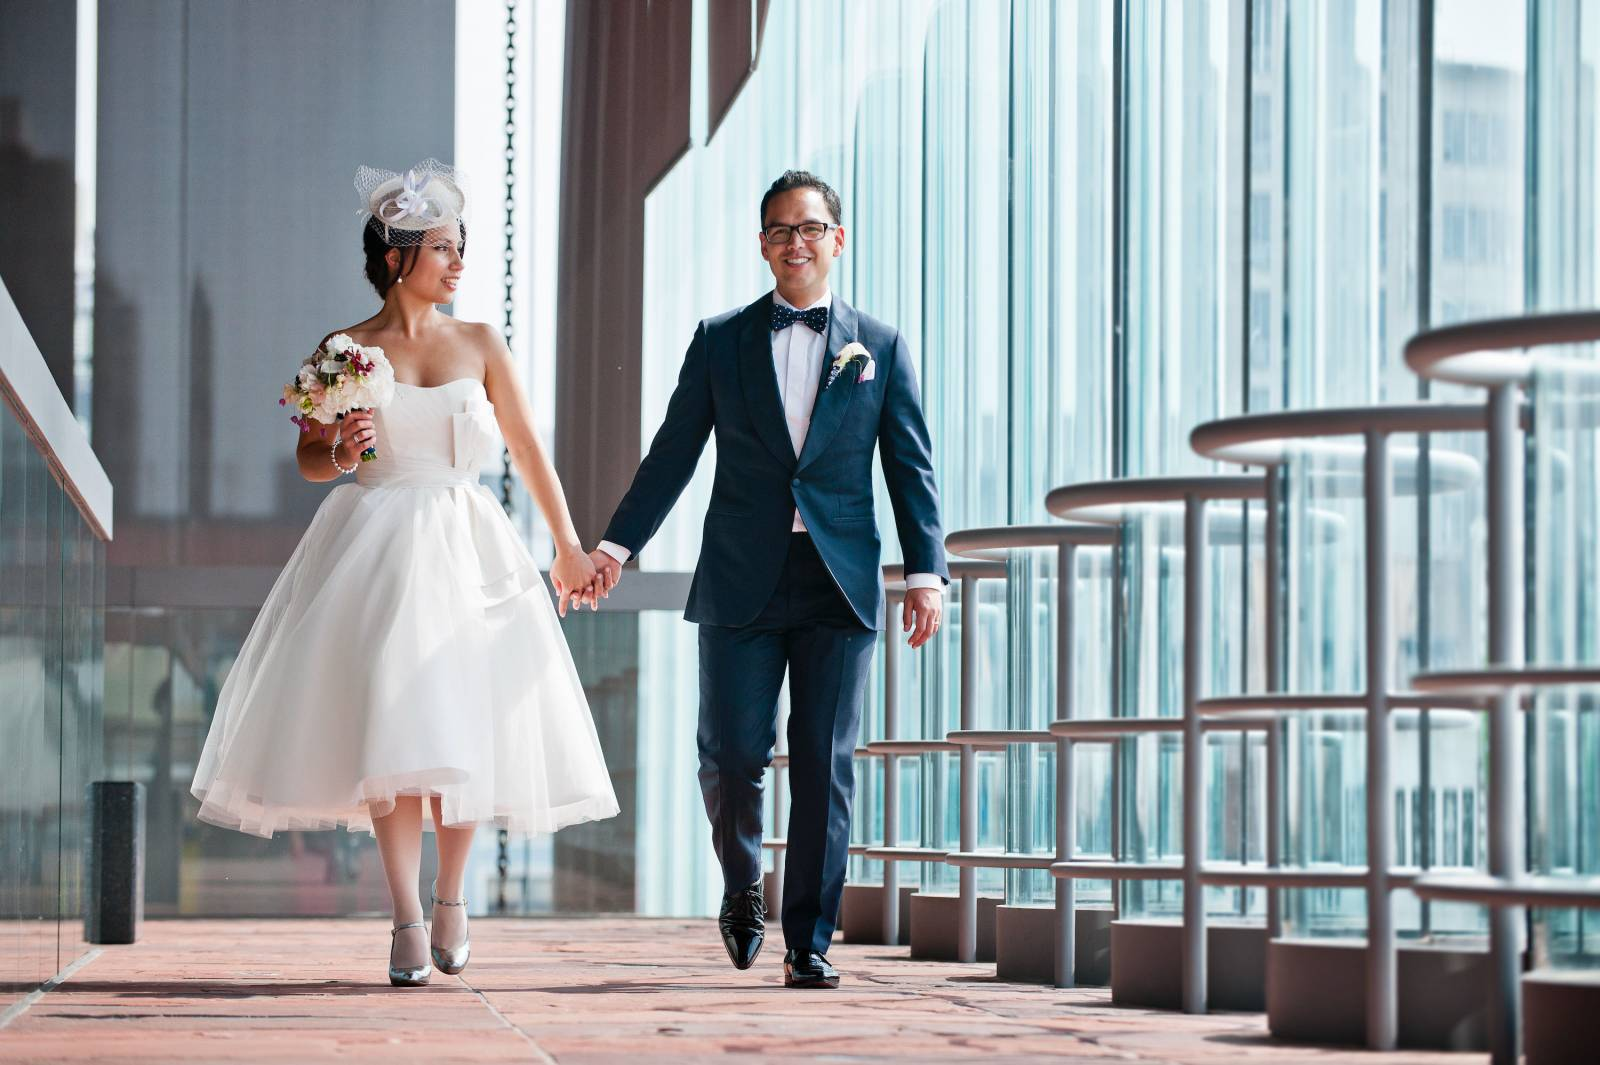 Foto Meeuw - House of Weddings - 1